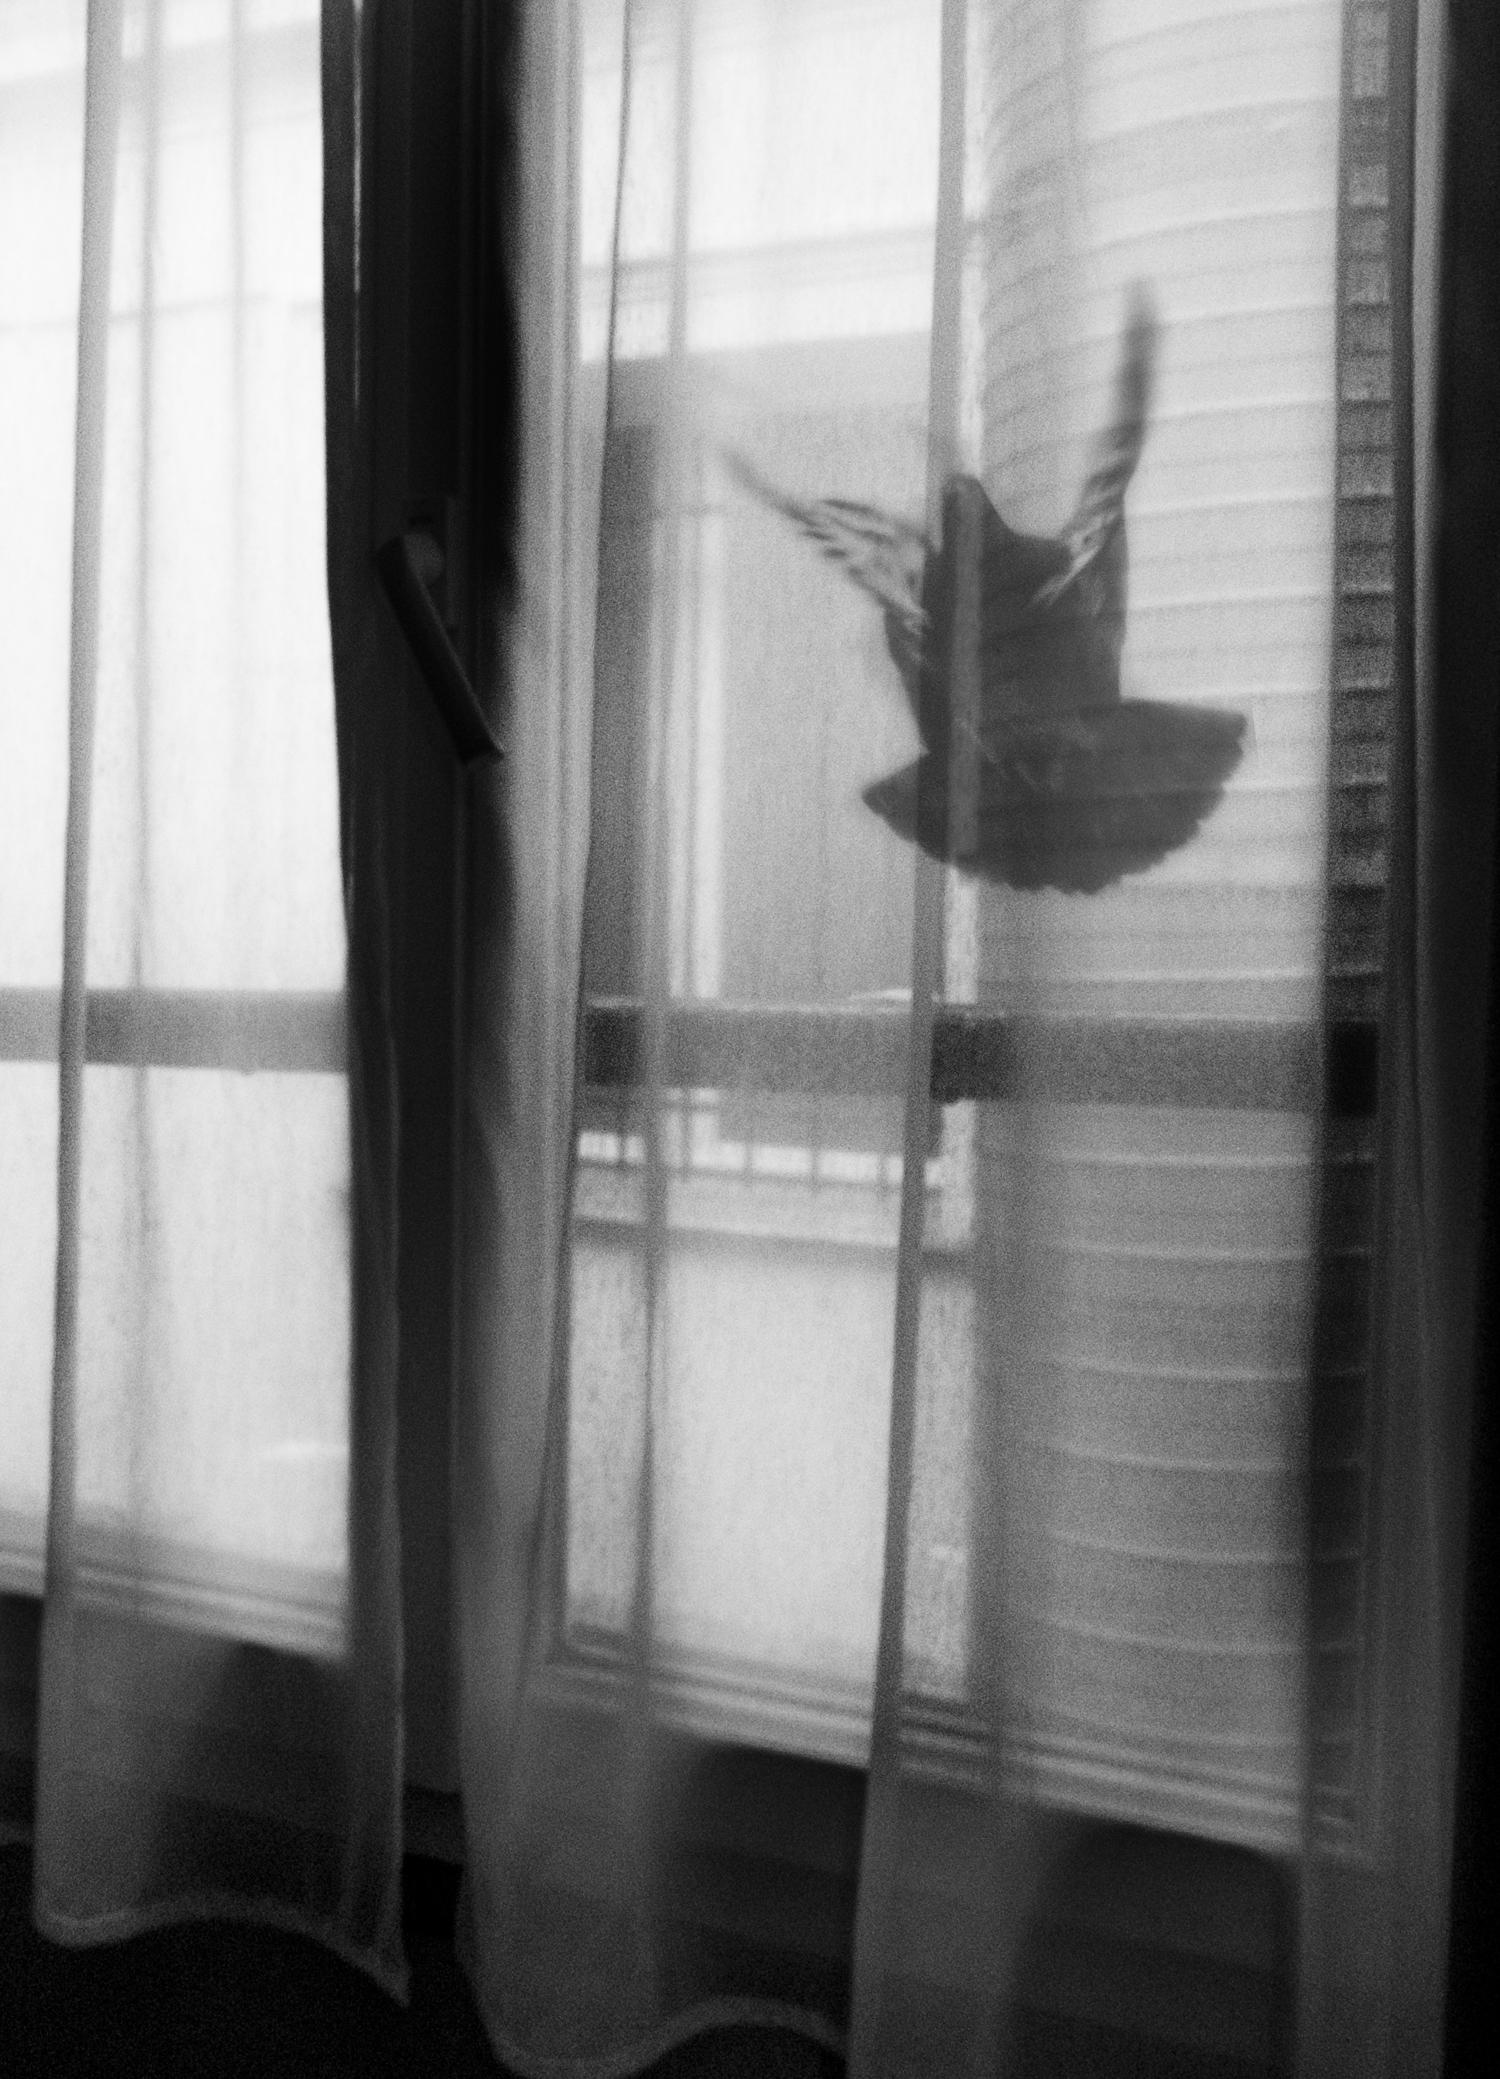 © Marcus Erixson Titel: Homage till Kenneth Plats/Datum: Paris 2015 Bildmått: 21x30 cm Teknik: Digital c-print Montering: Träram 30x40 cm Upplaga:  5  Signerad: Ja Pris: SEK  4500